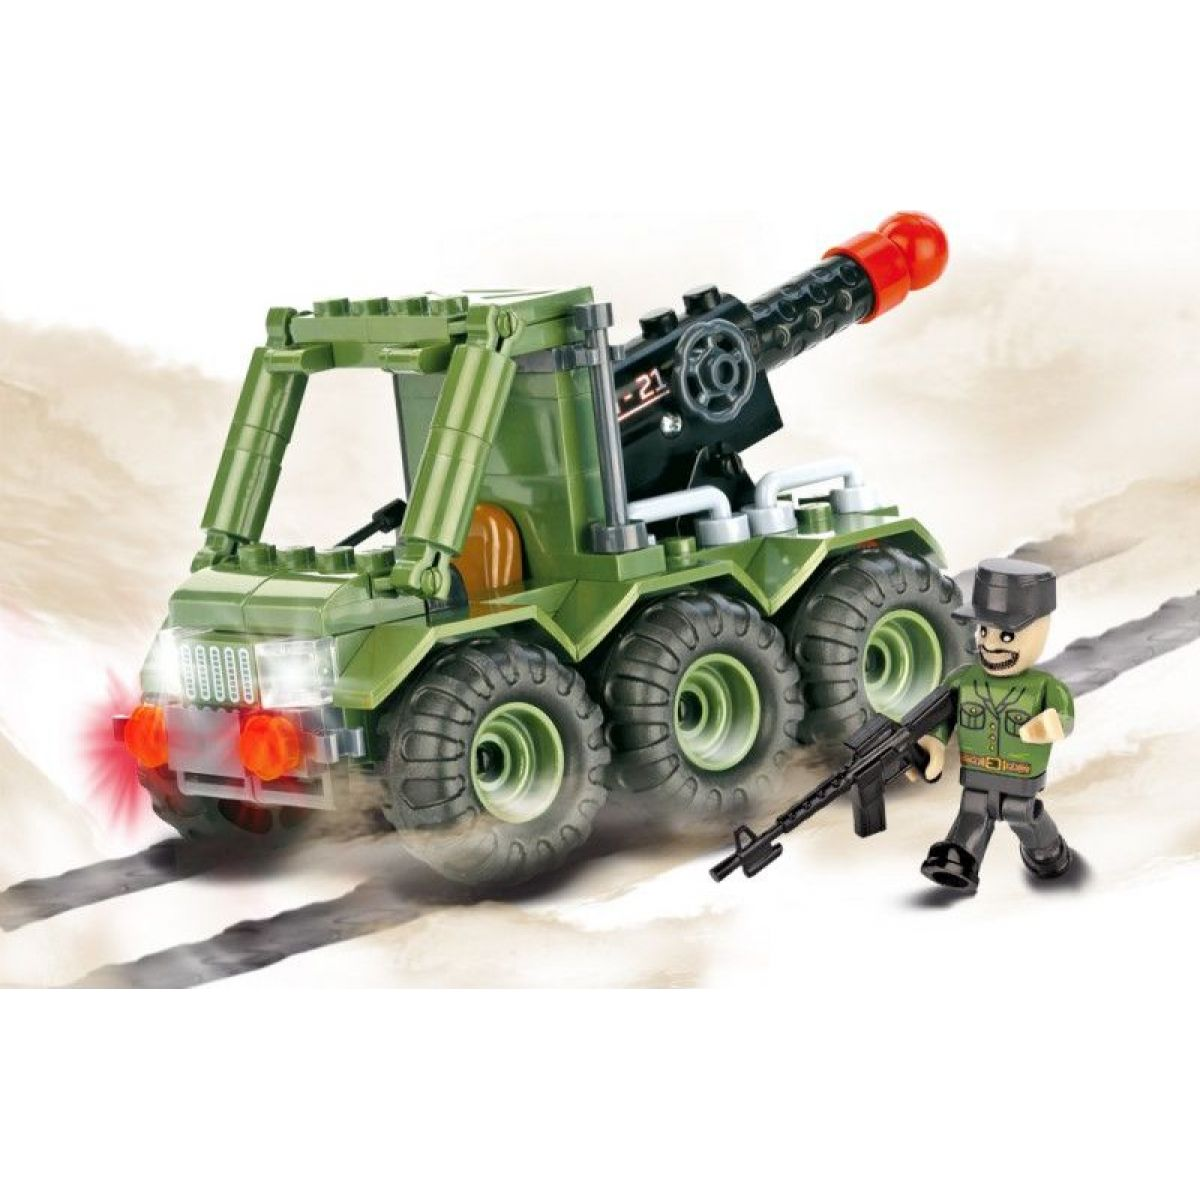 Cobi Malá armáda 2196 G21 raketomet